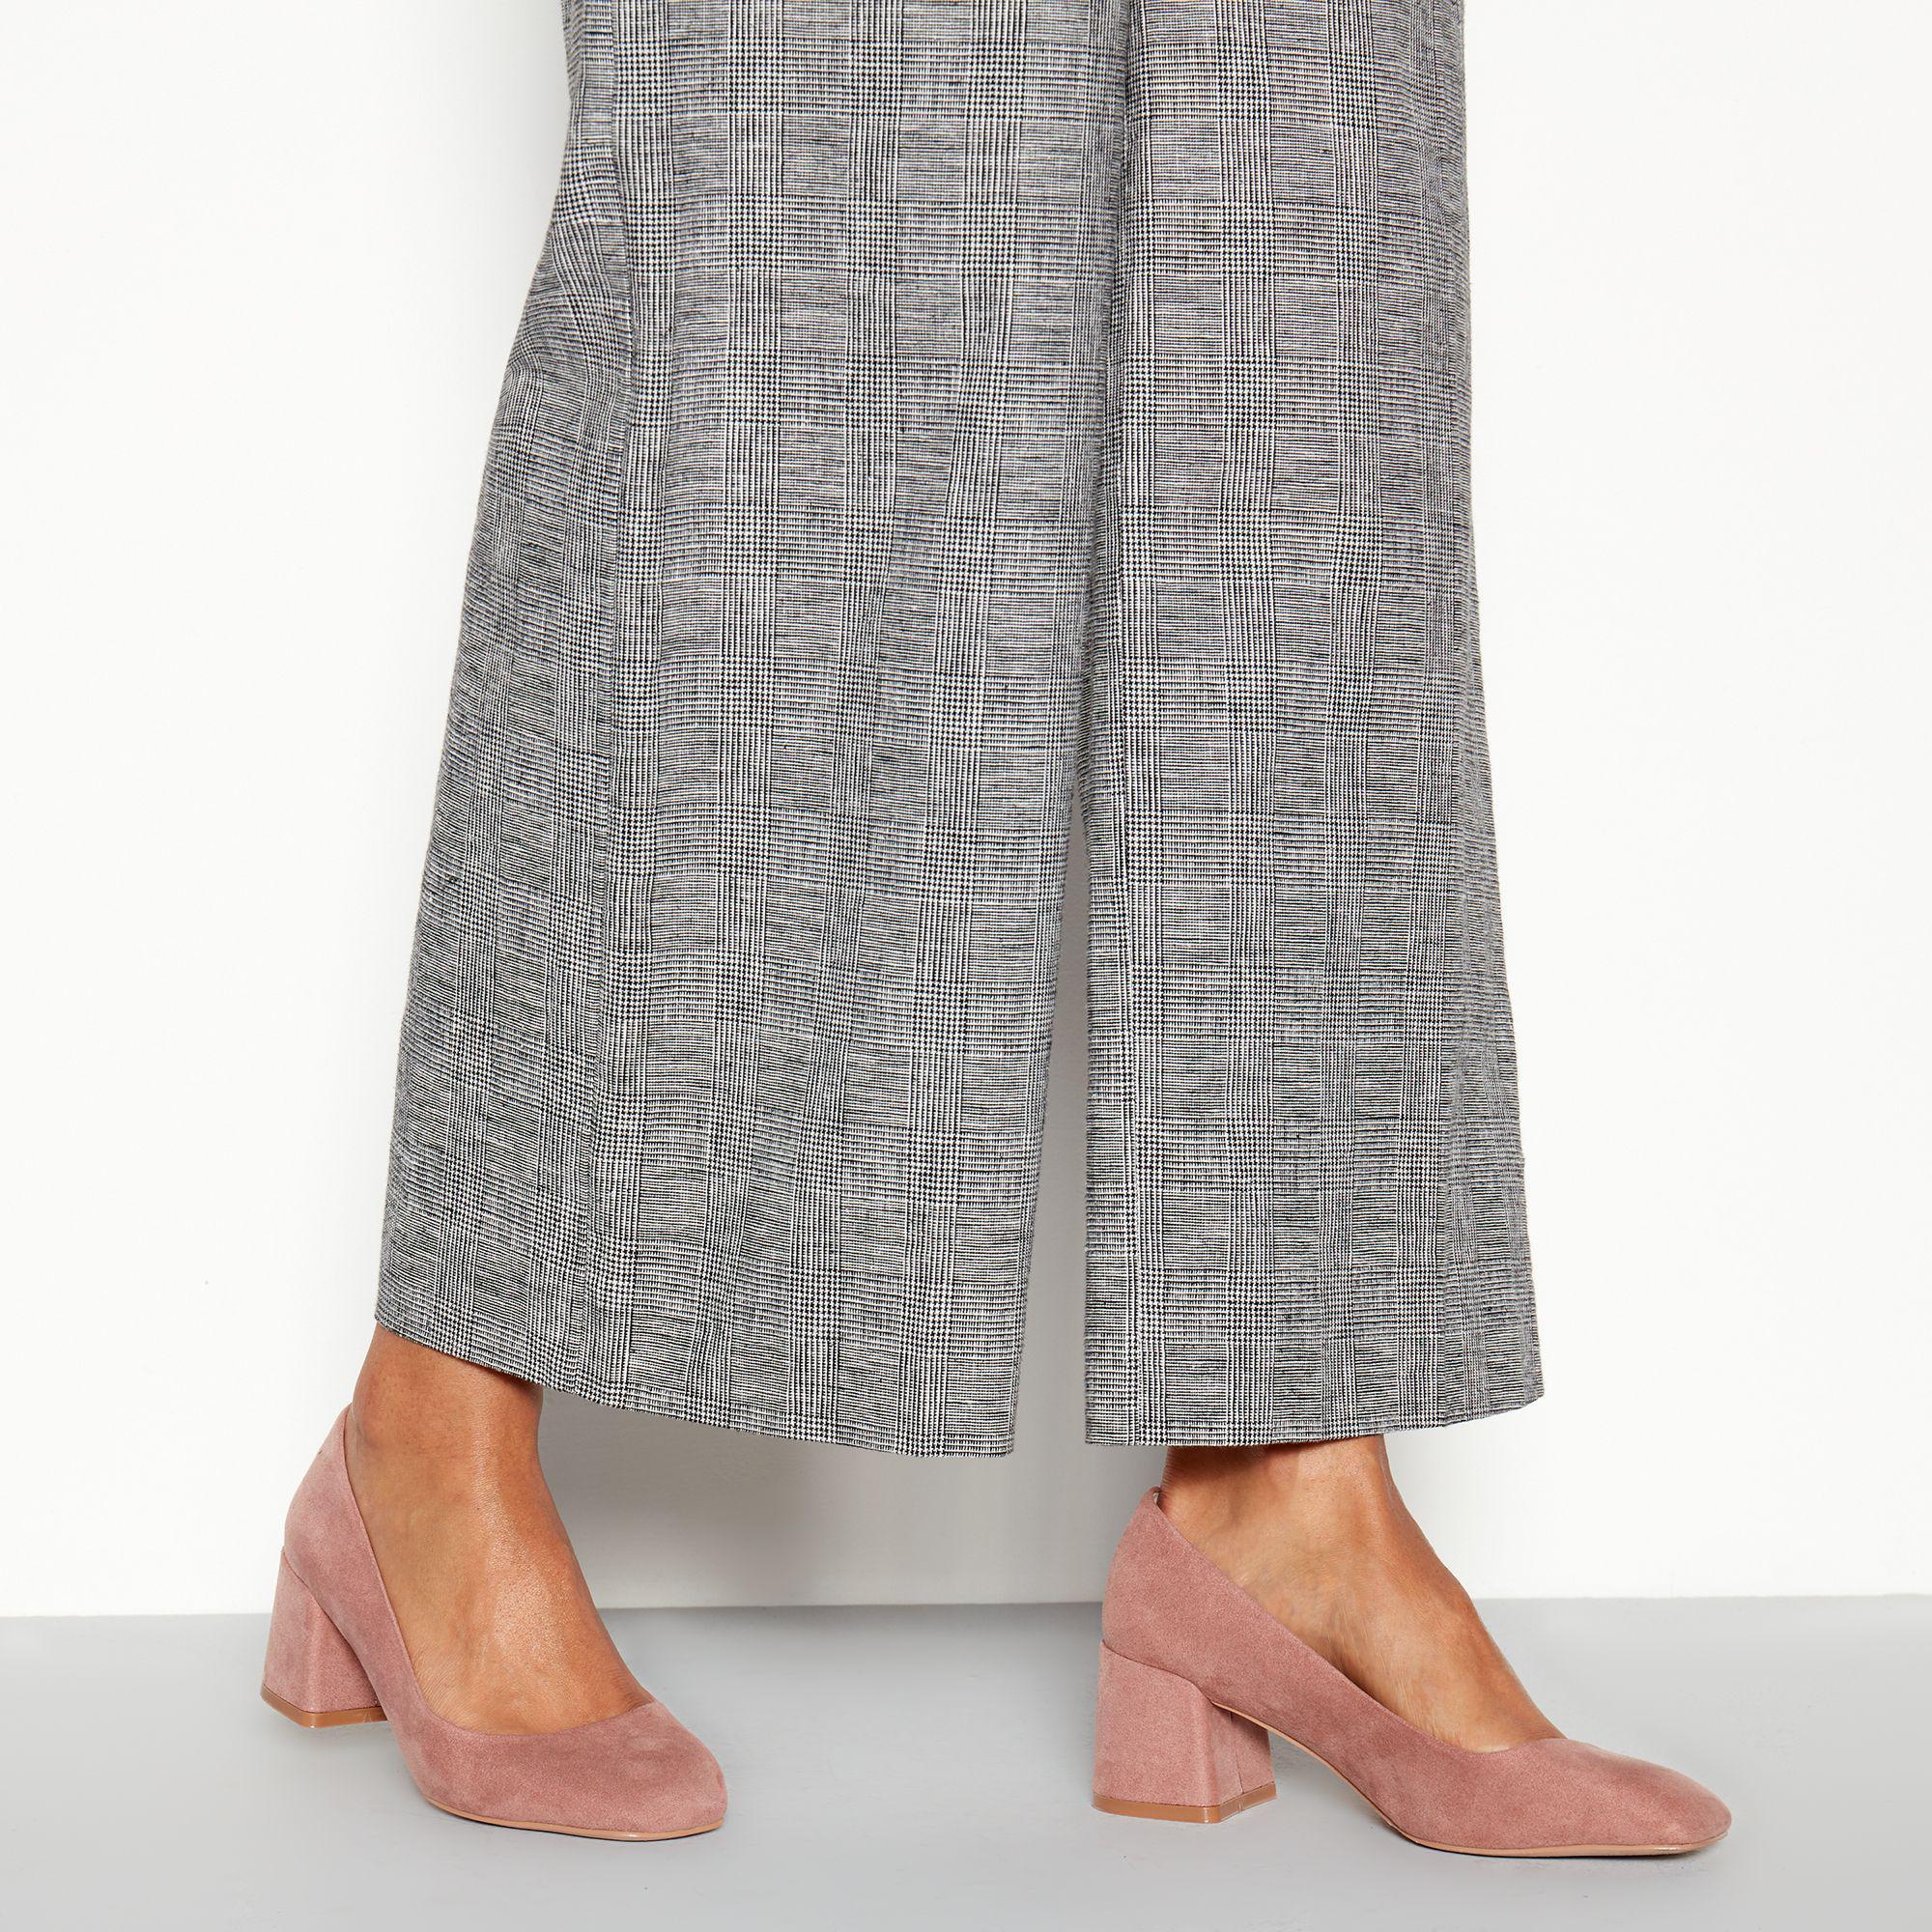 clearance sale best selection of famous designer brand Faith Natural Suedette 'wandice' Block Heel Wide Fit Shoes ...